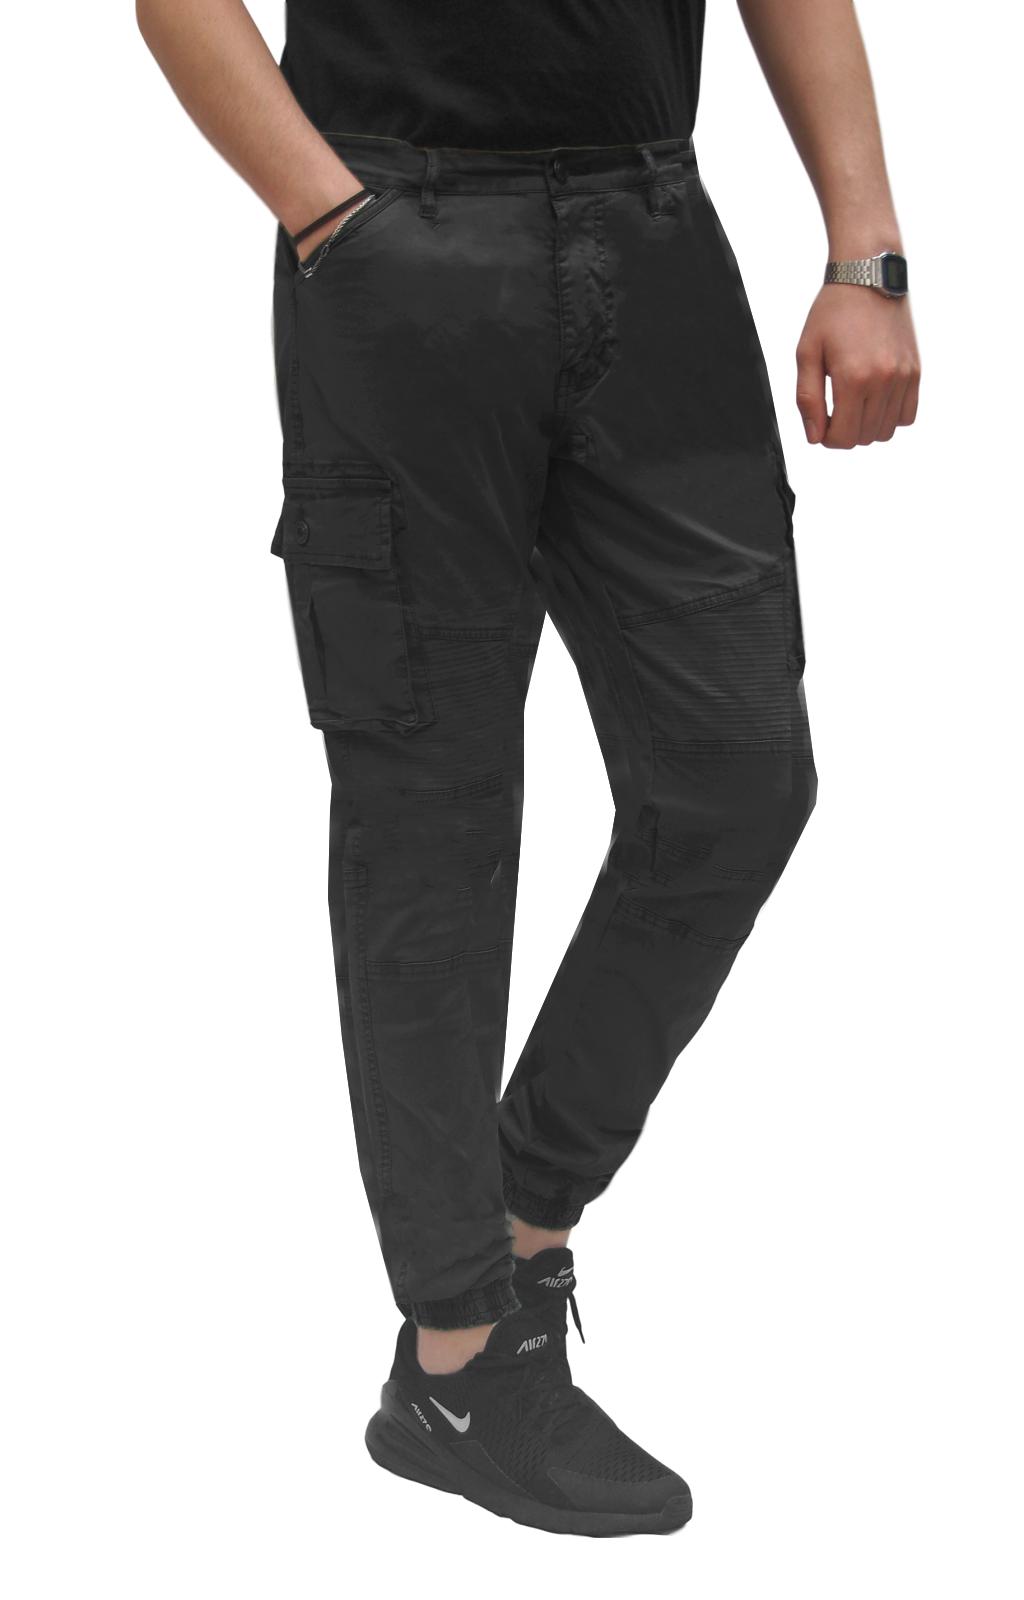 Pantalone-Uomo-Cargo-Con-Tasconi-Invernale-Verde-Blu-Nero-Marrone-Pantaloni-slim miniatura 14